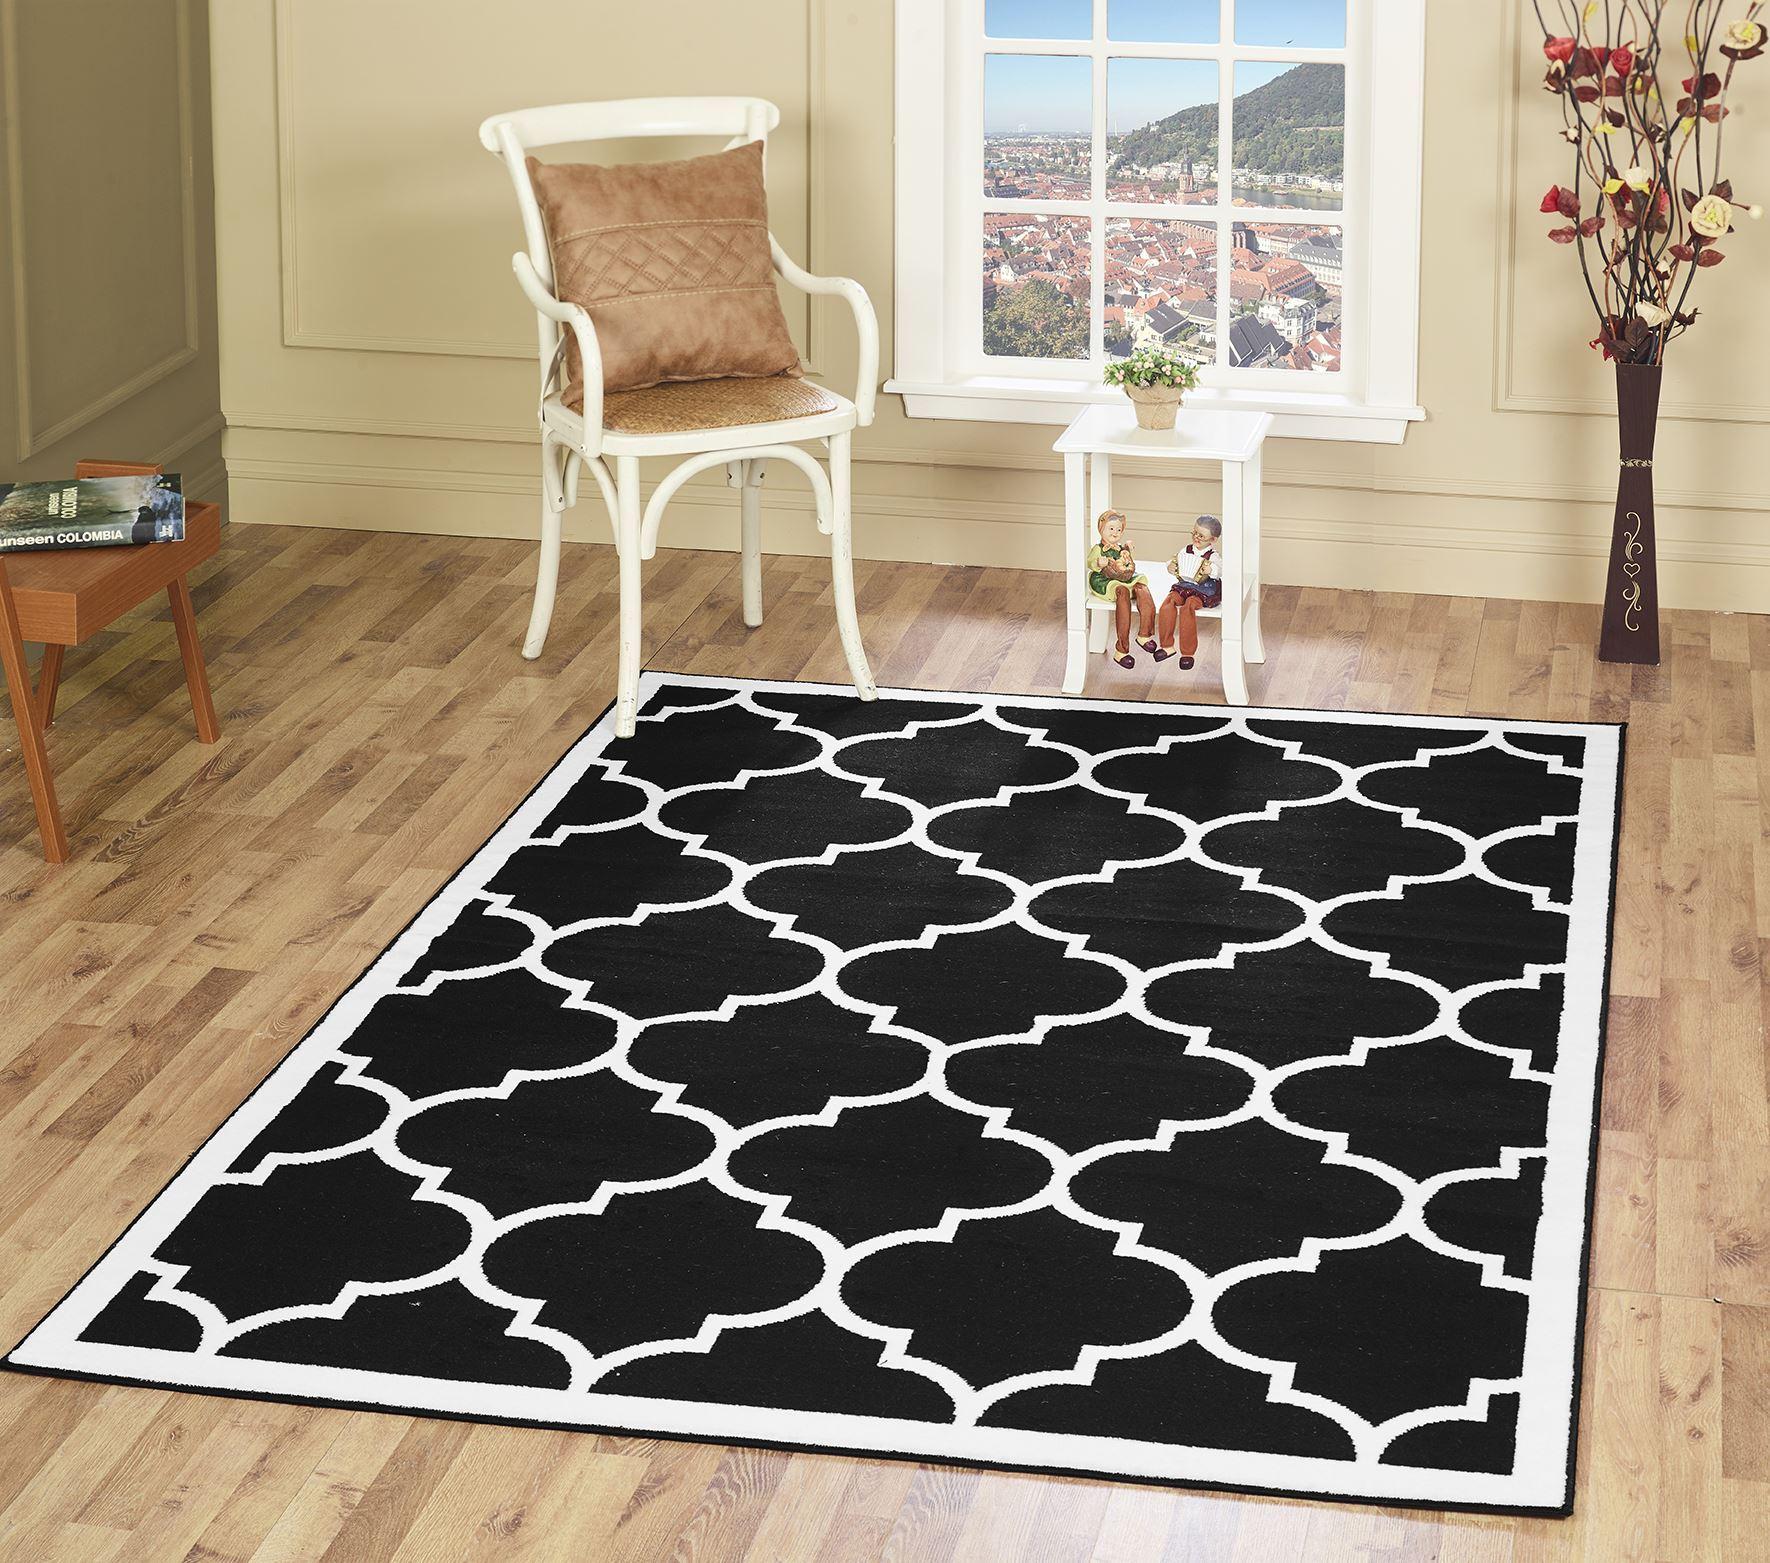 Large Black Geometric Moroccan Trellis Thin Carpets Modern ...